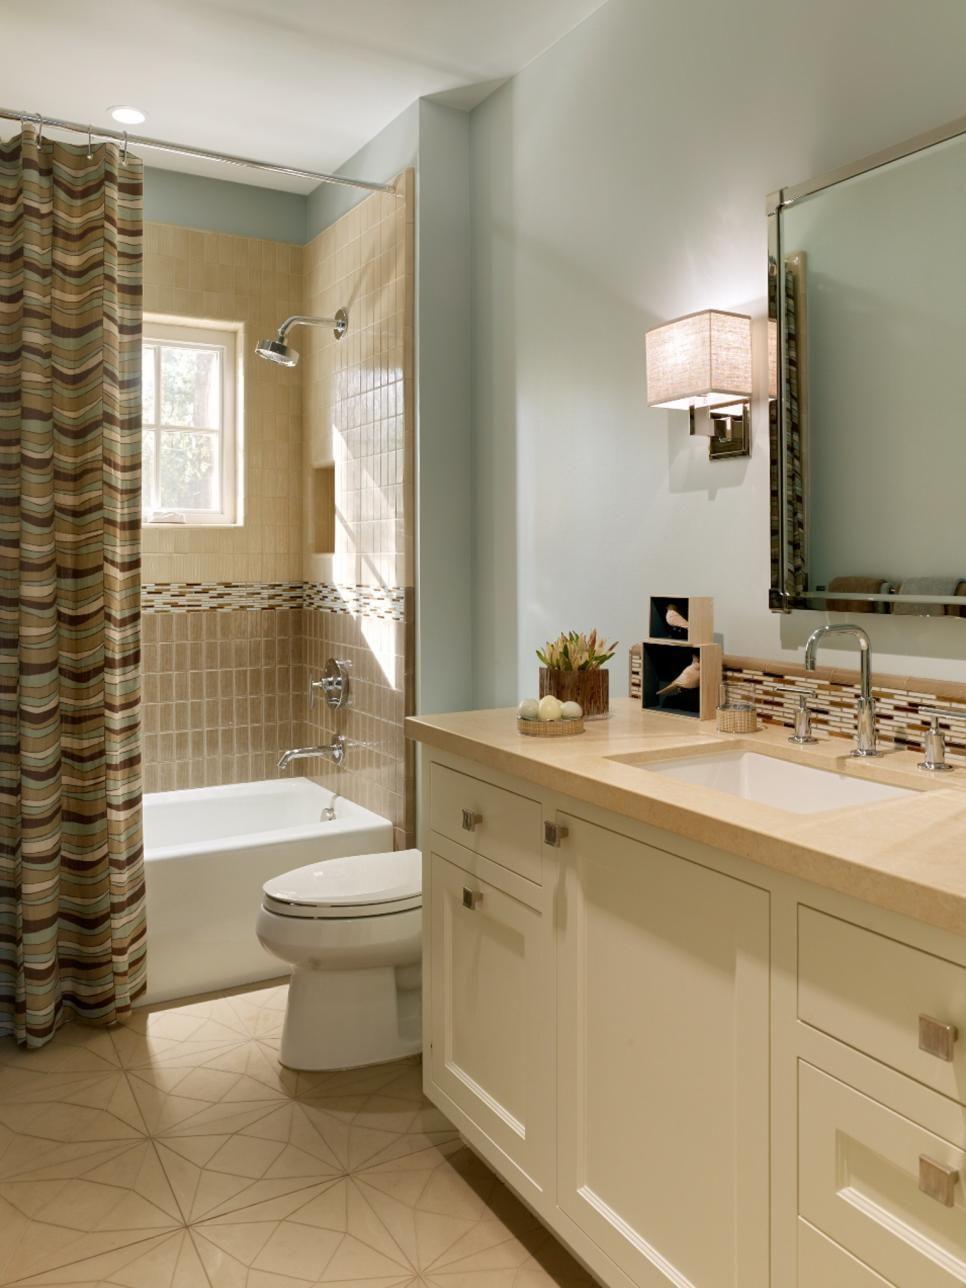 European Cabinets Palo Alto 1000 Images About Bath Ideas On Pinterest Blue And Blue